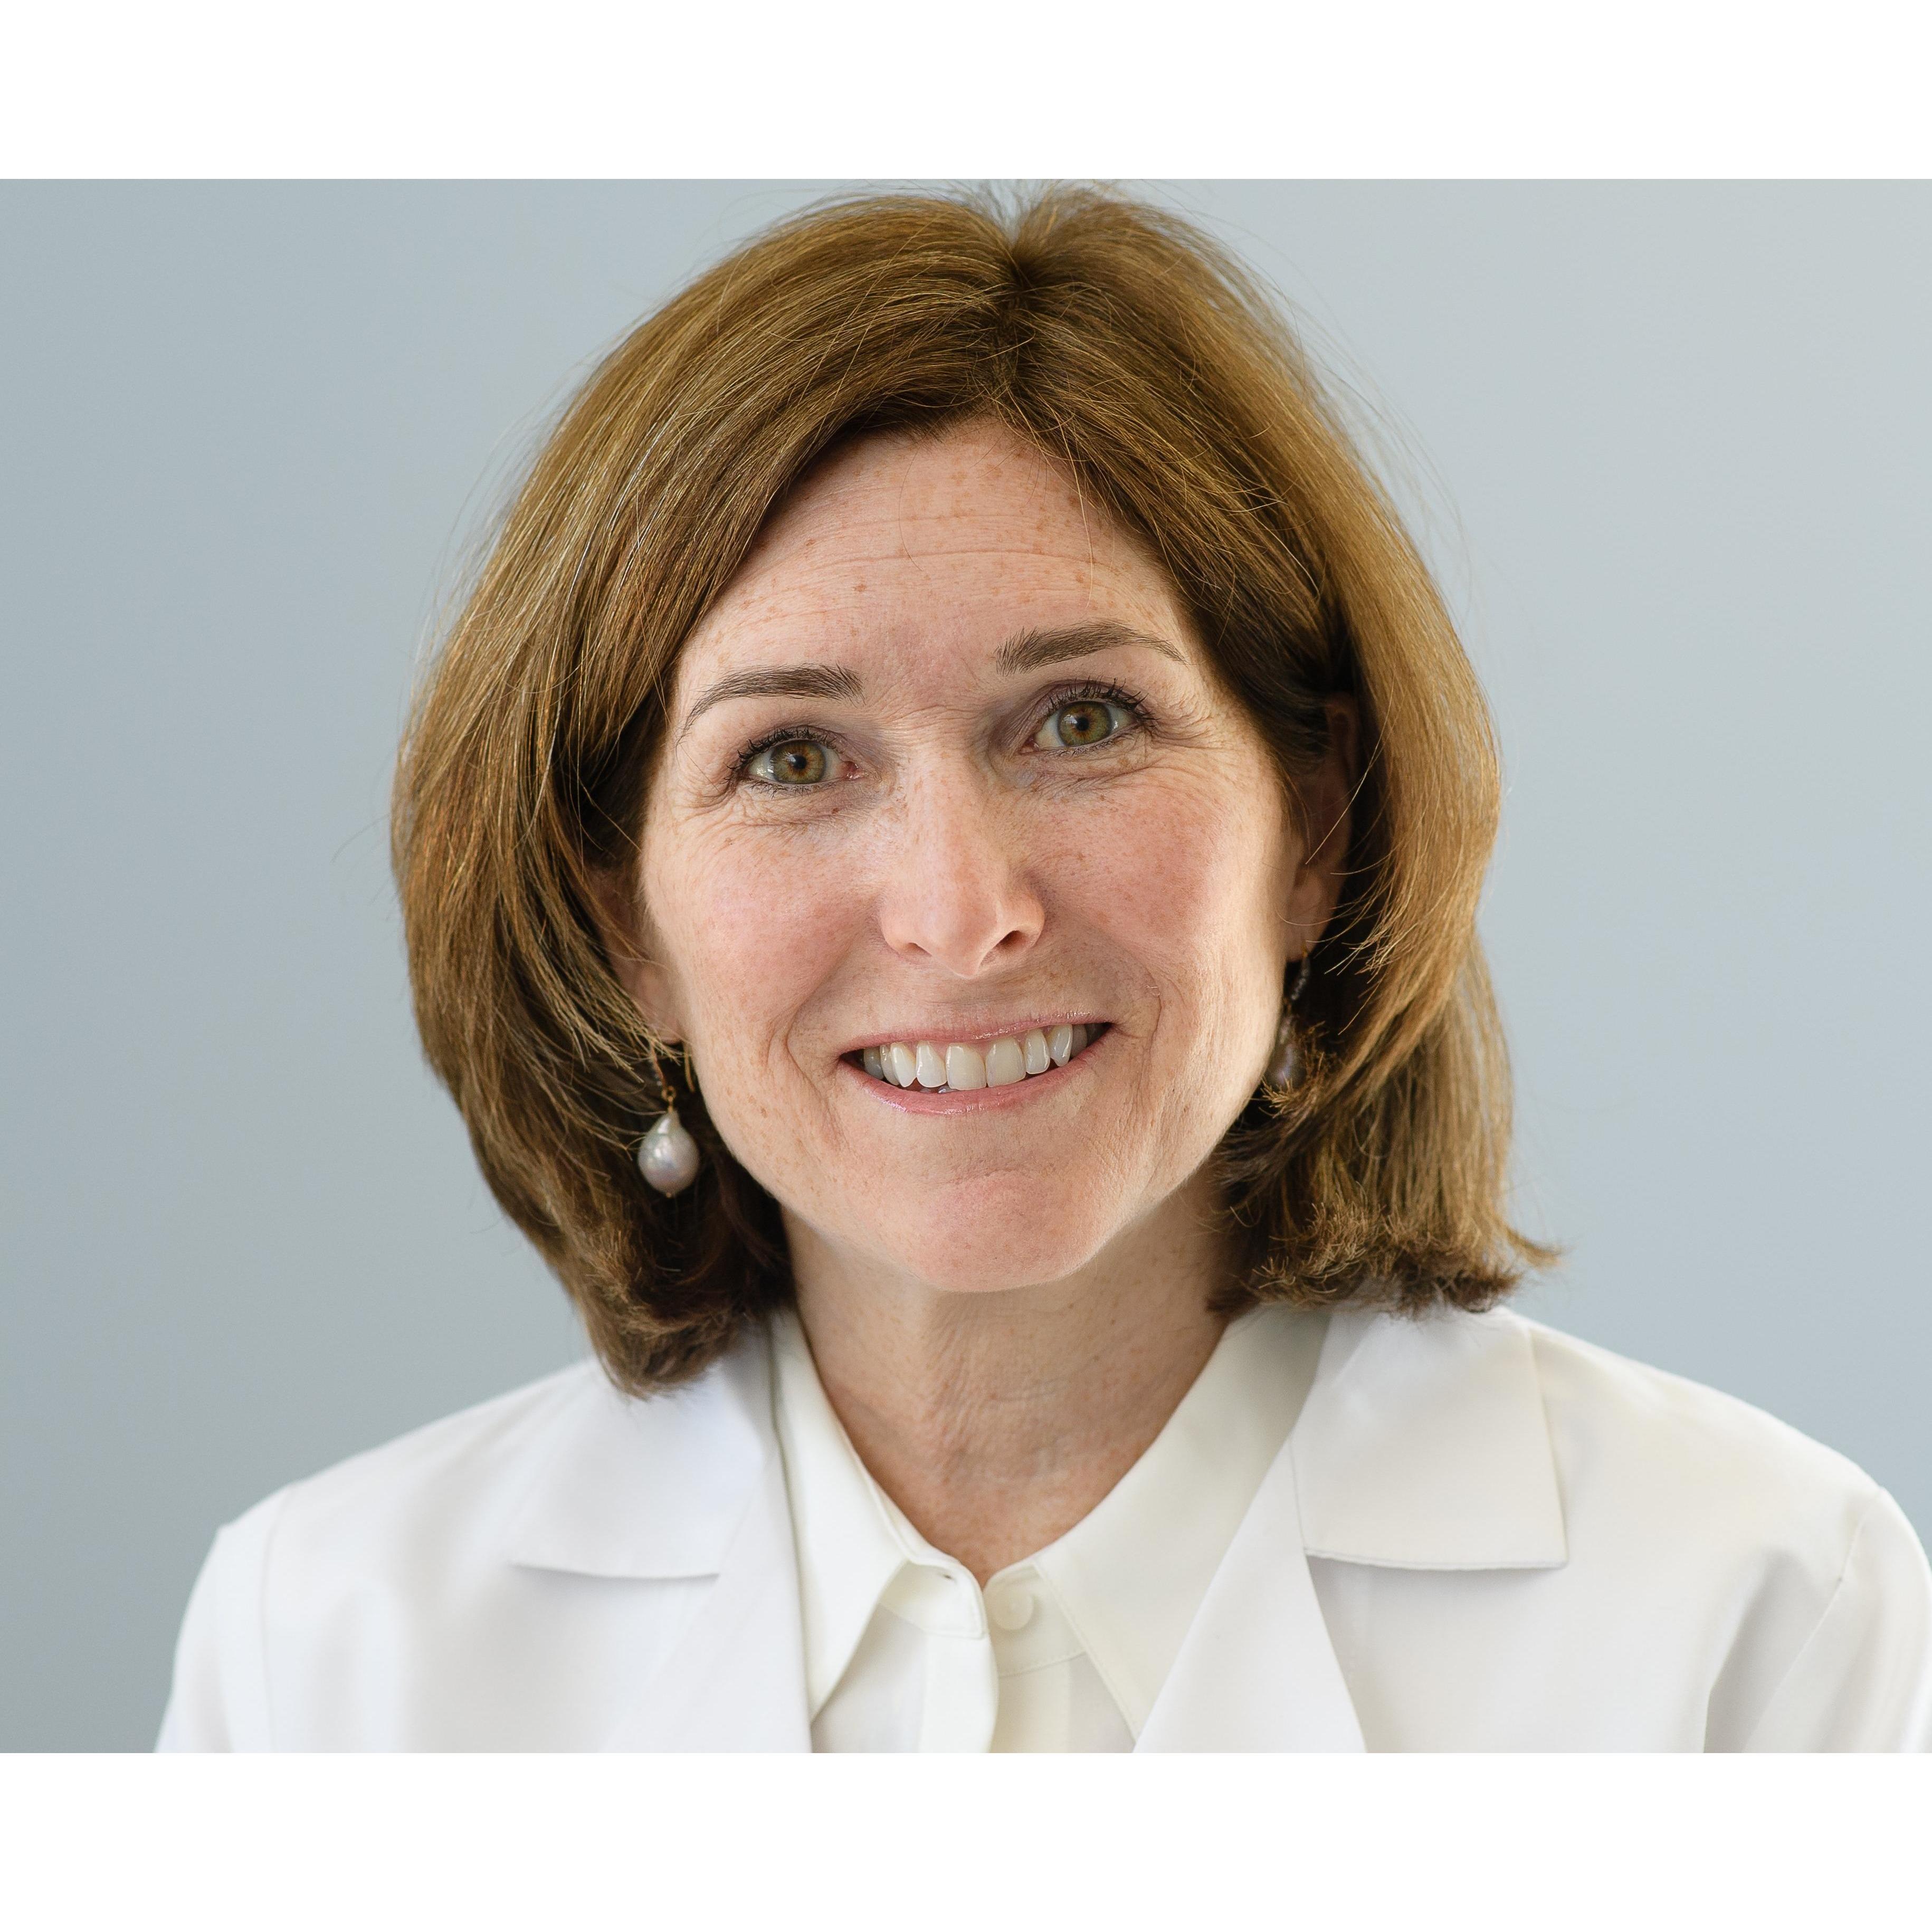 Kathleen LeMaitre, MD at 134 South Avenue Weston, MA